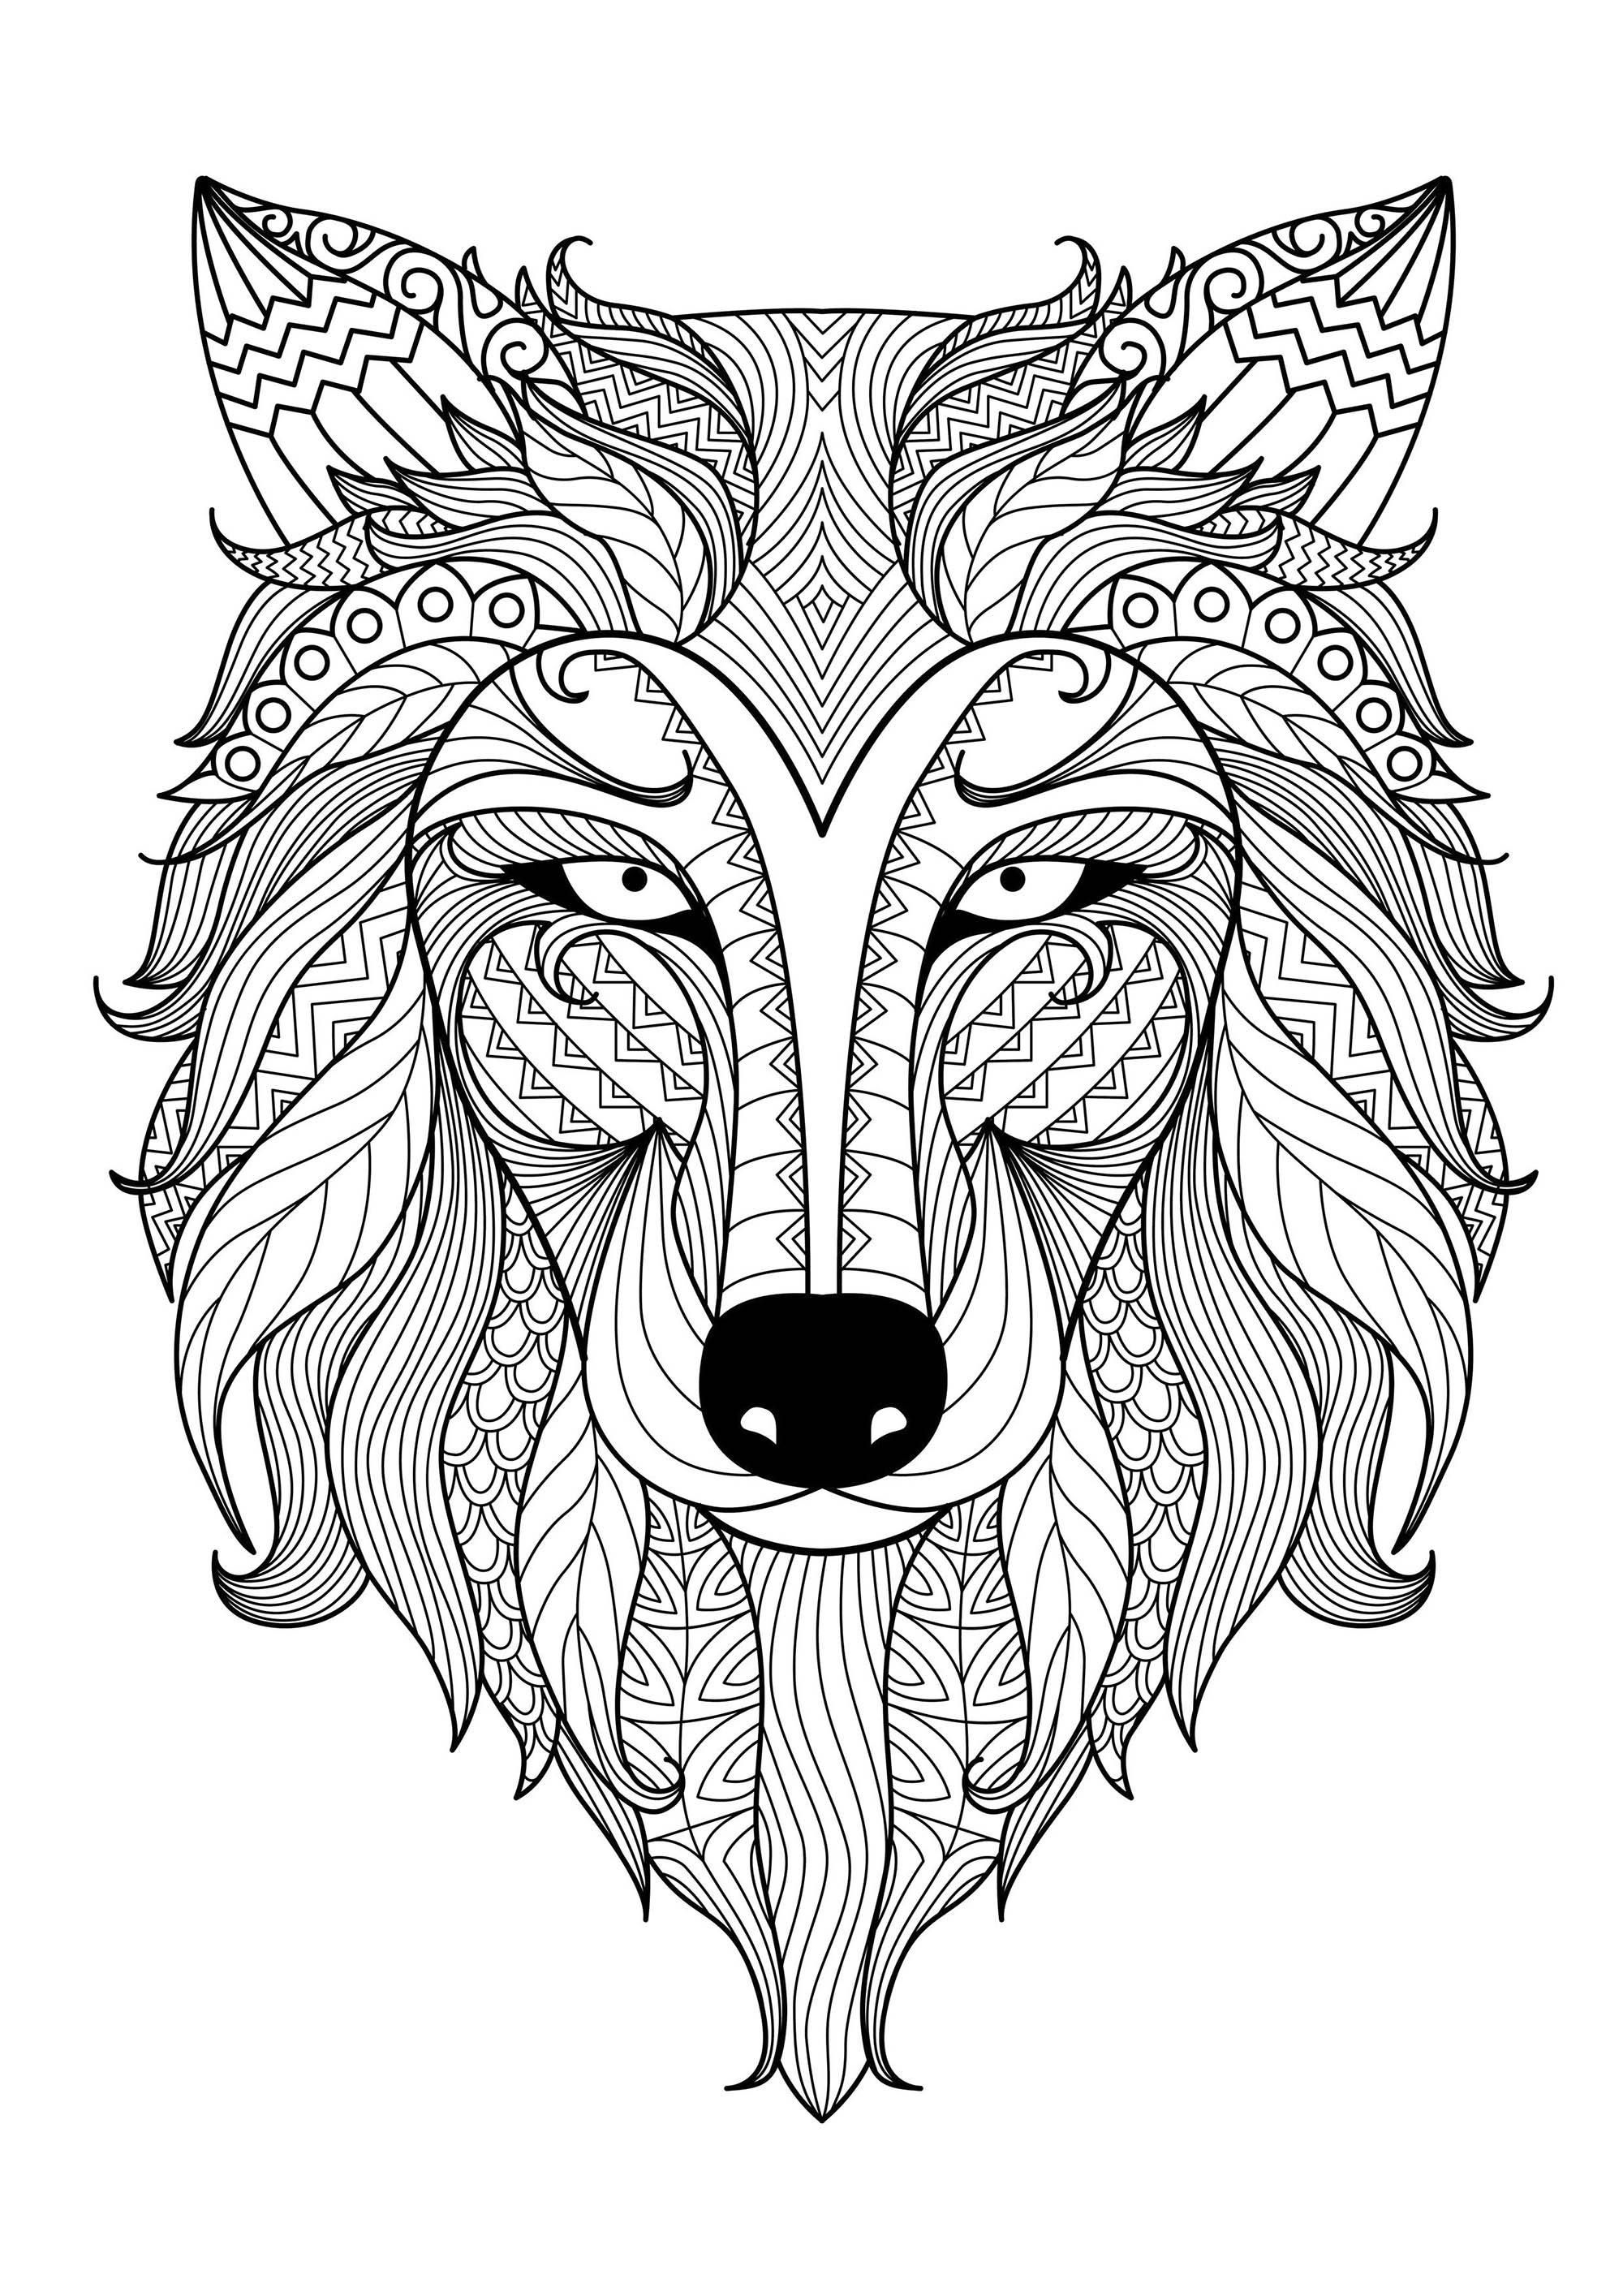 Beau Image Coloriage Loup